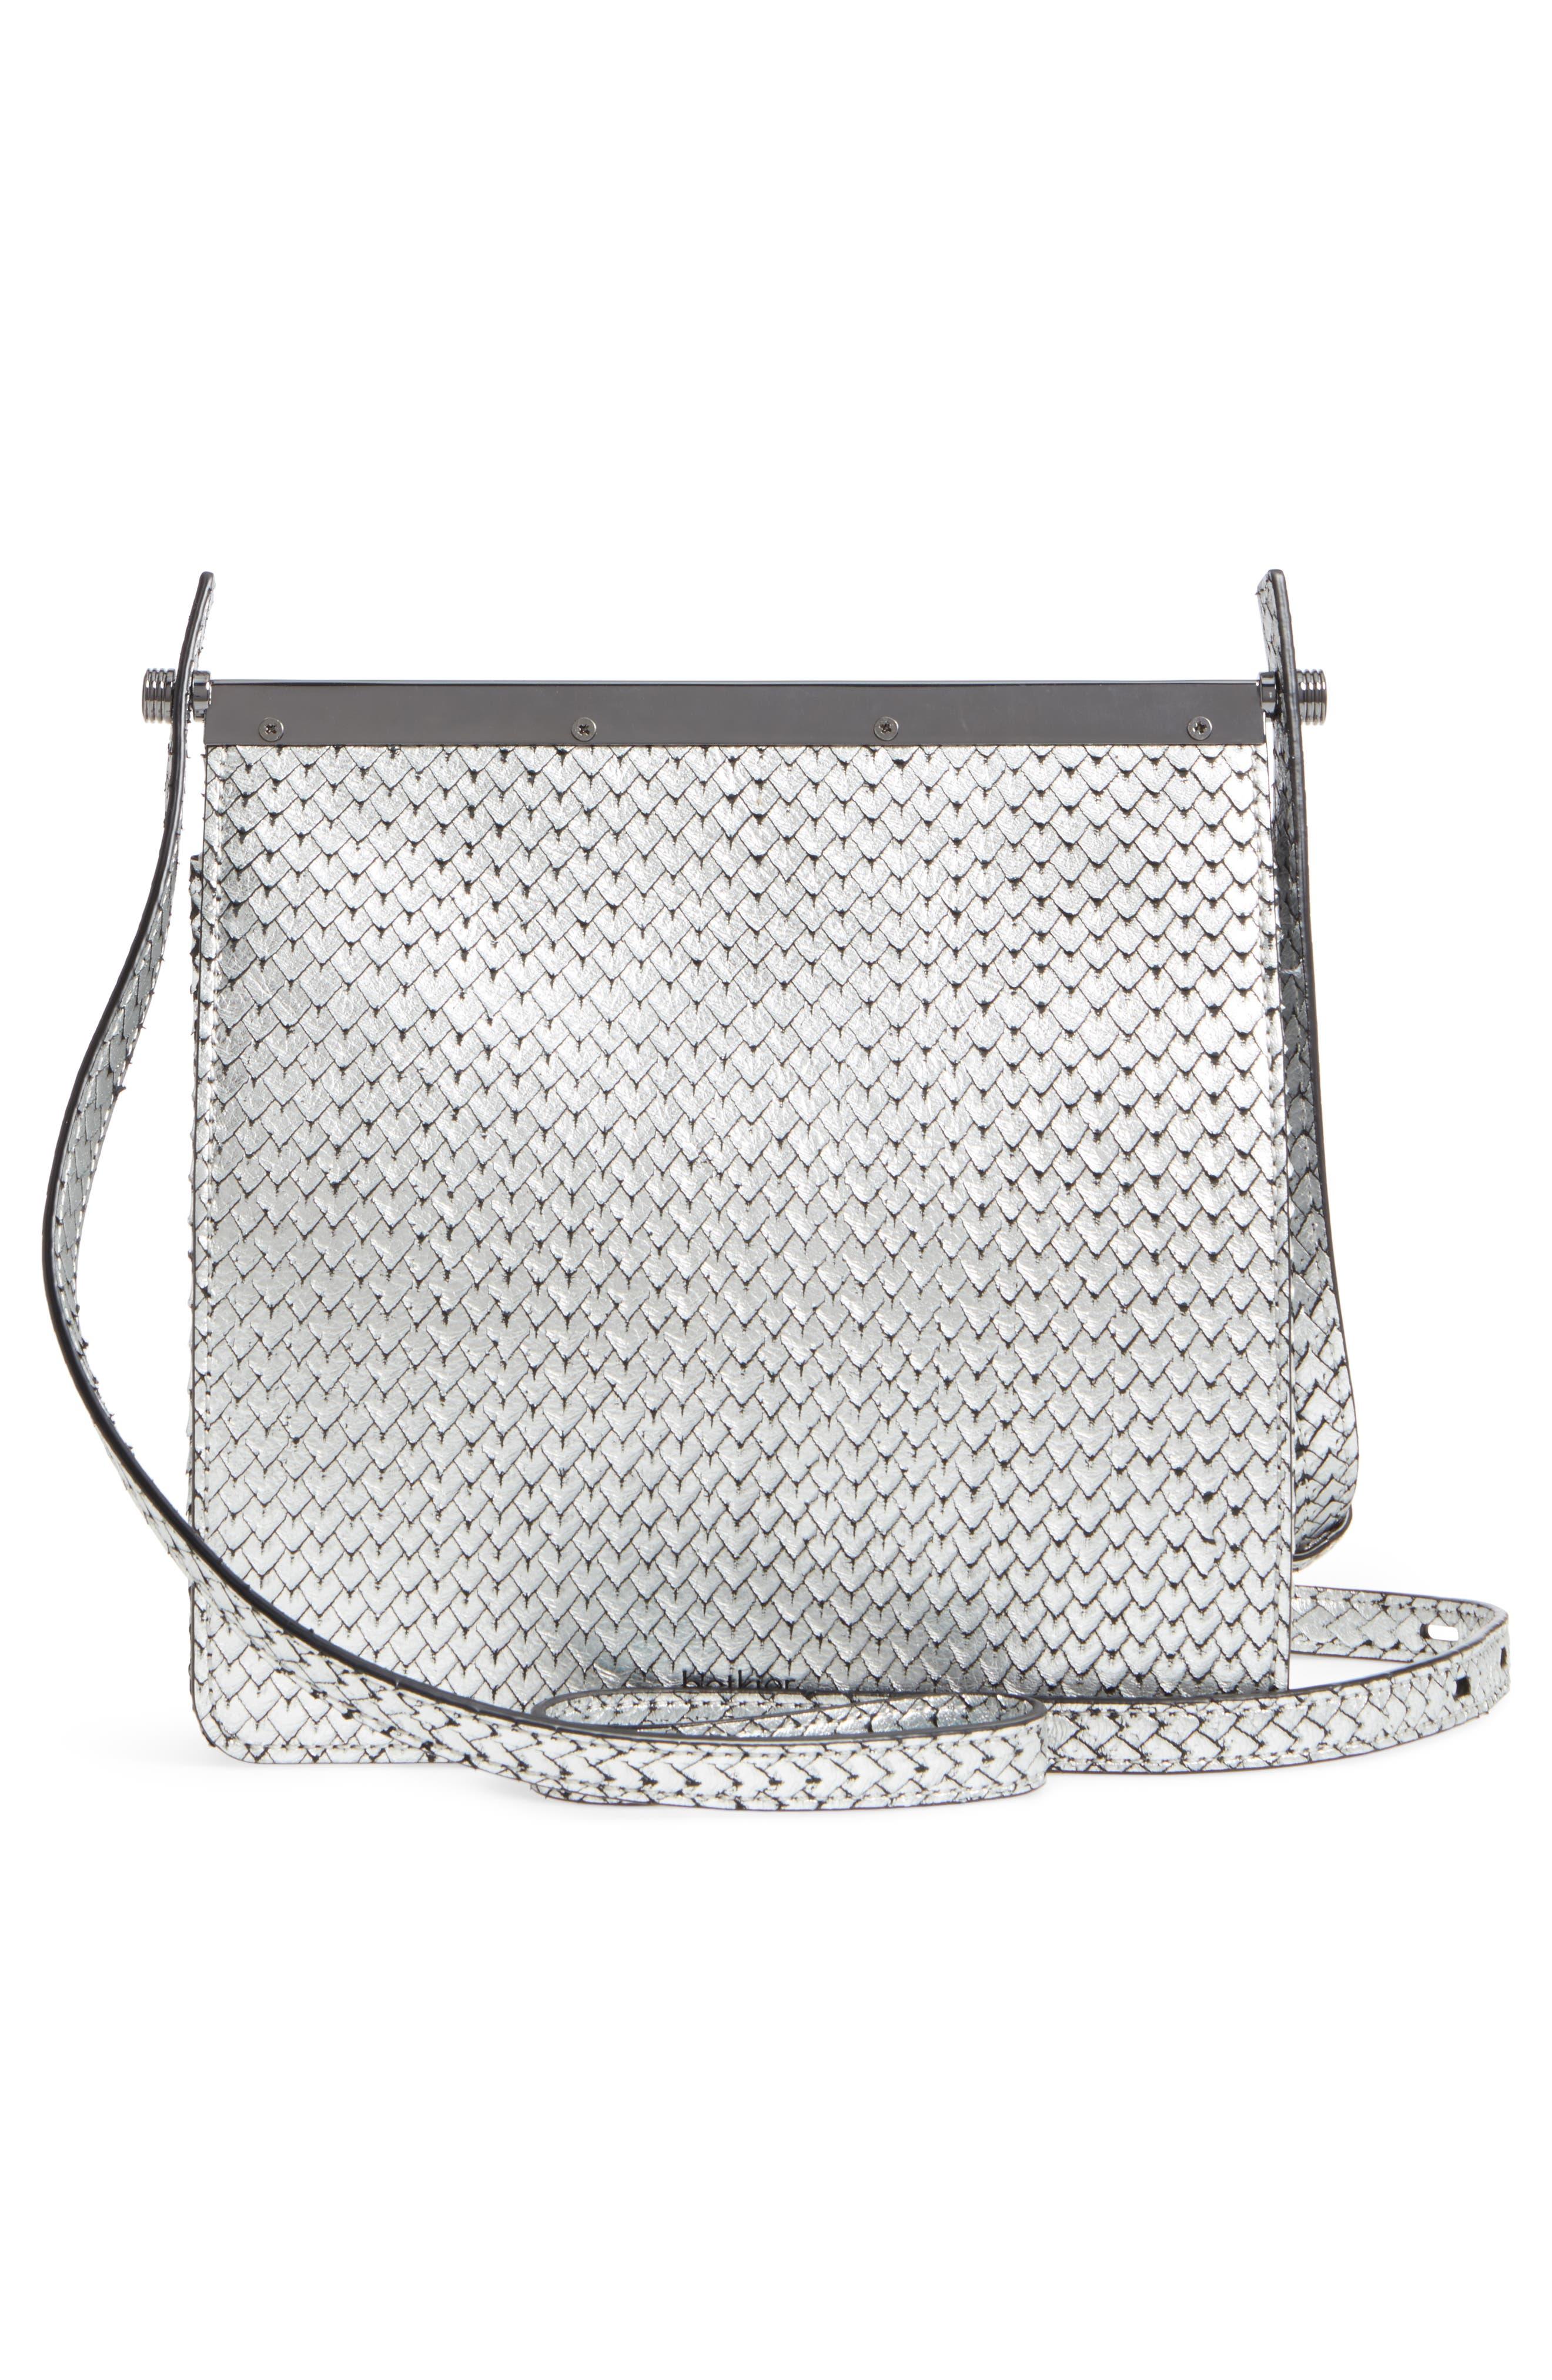 Alternate Image 3  - Botkier Crawford Calfskin Leather Crossbody Bag